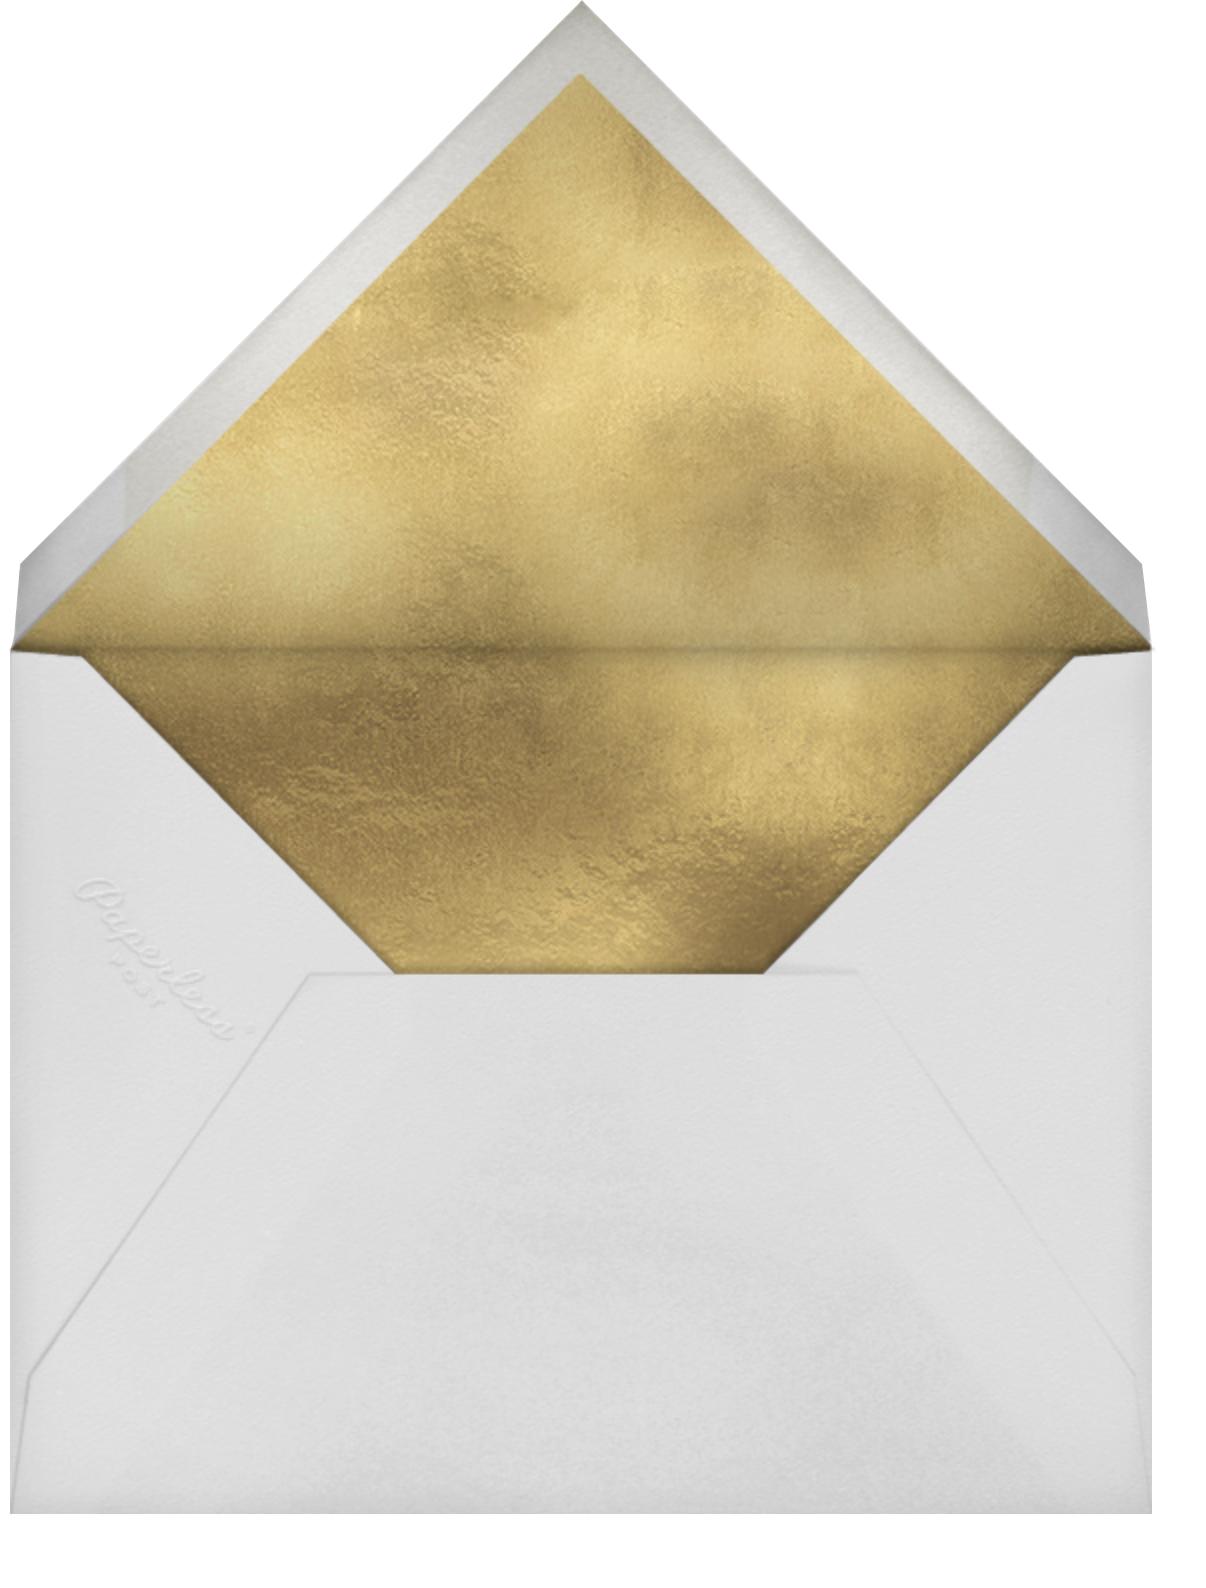 Pressed Poppies - Oscar de la Renta - Adult birthday - envelope back